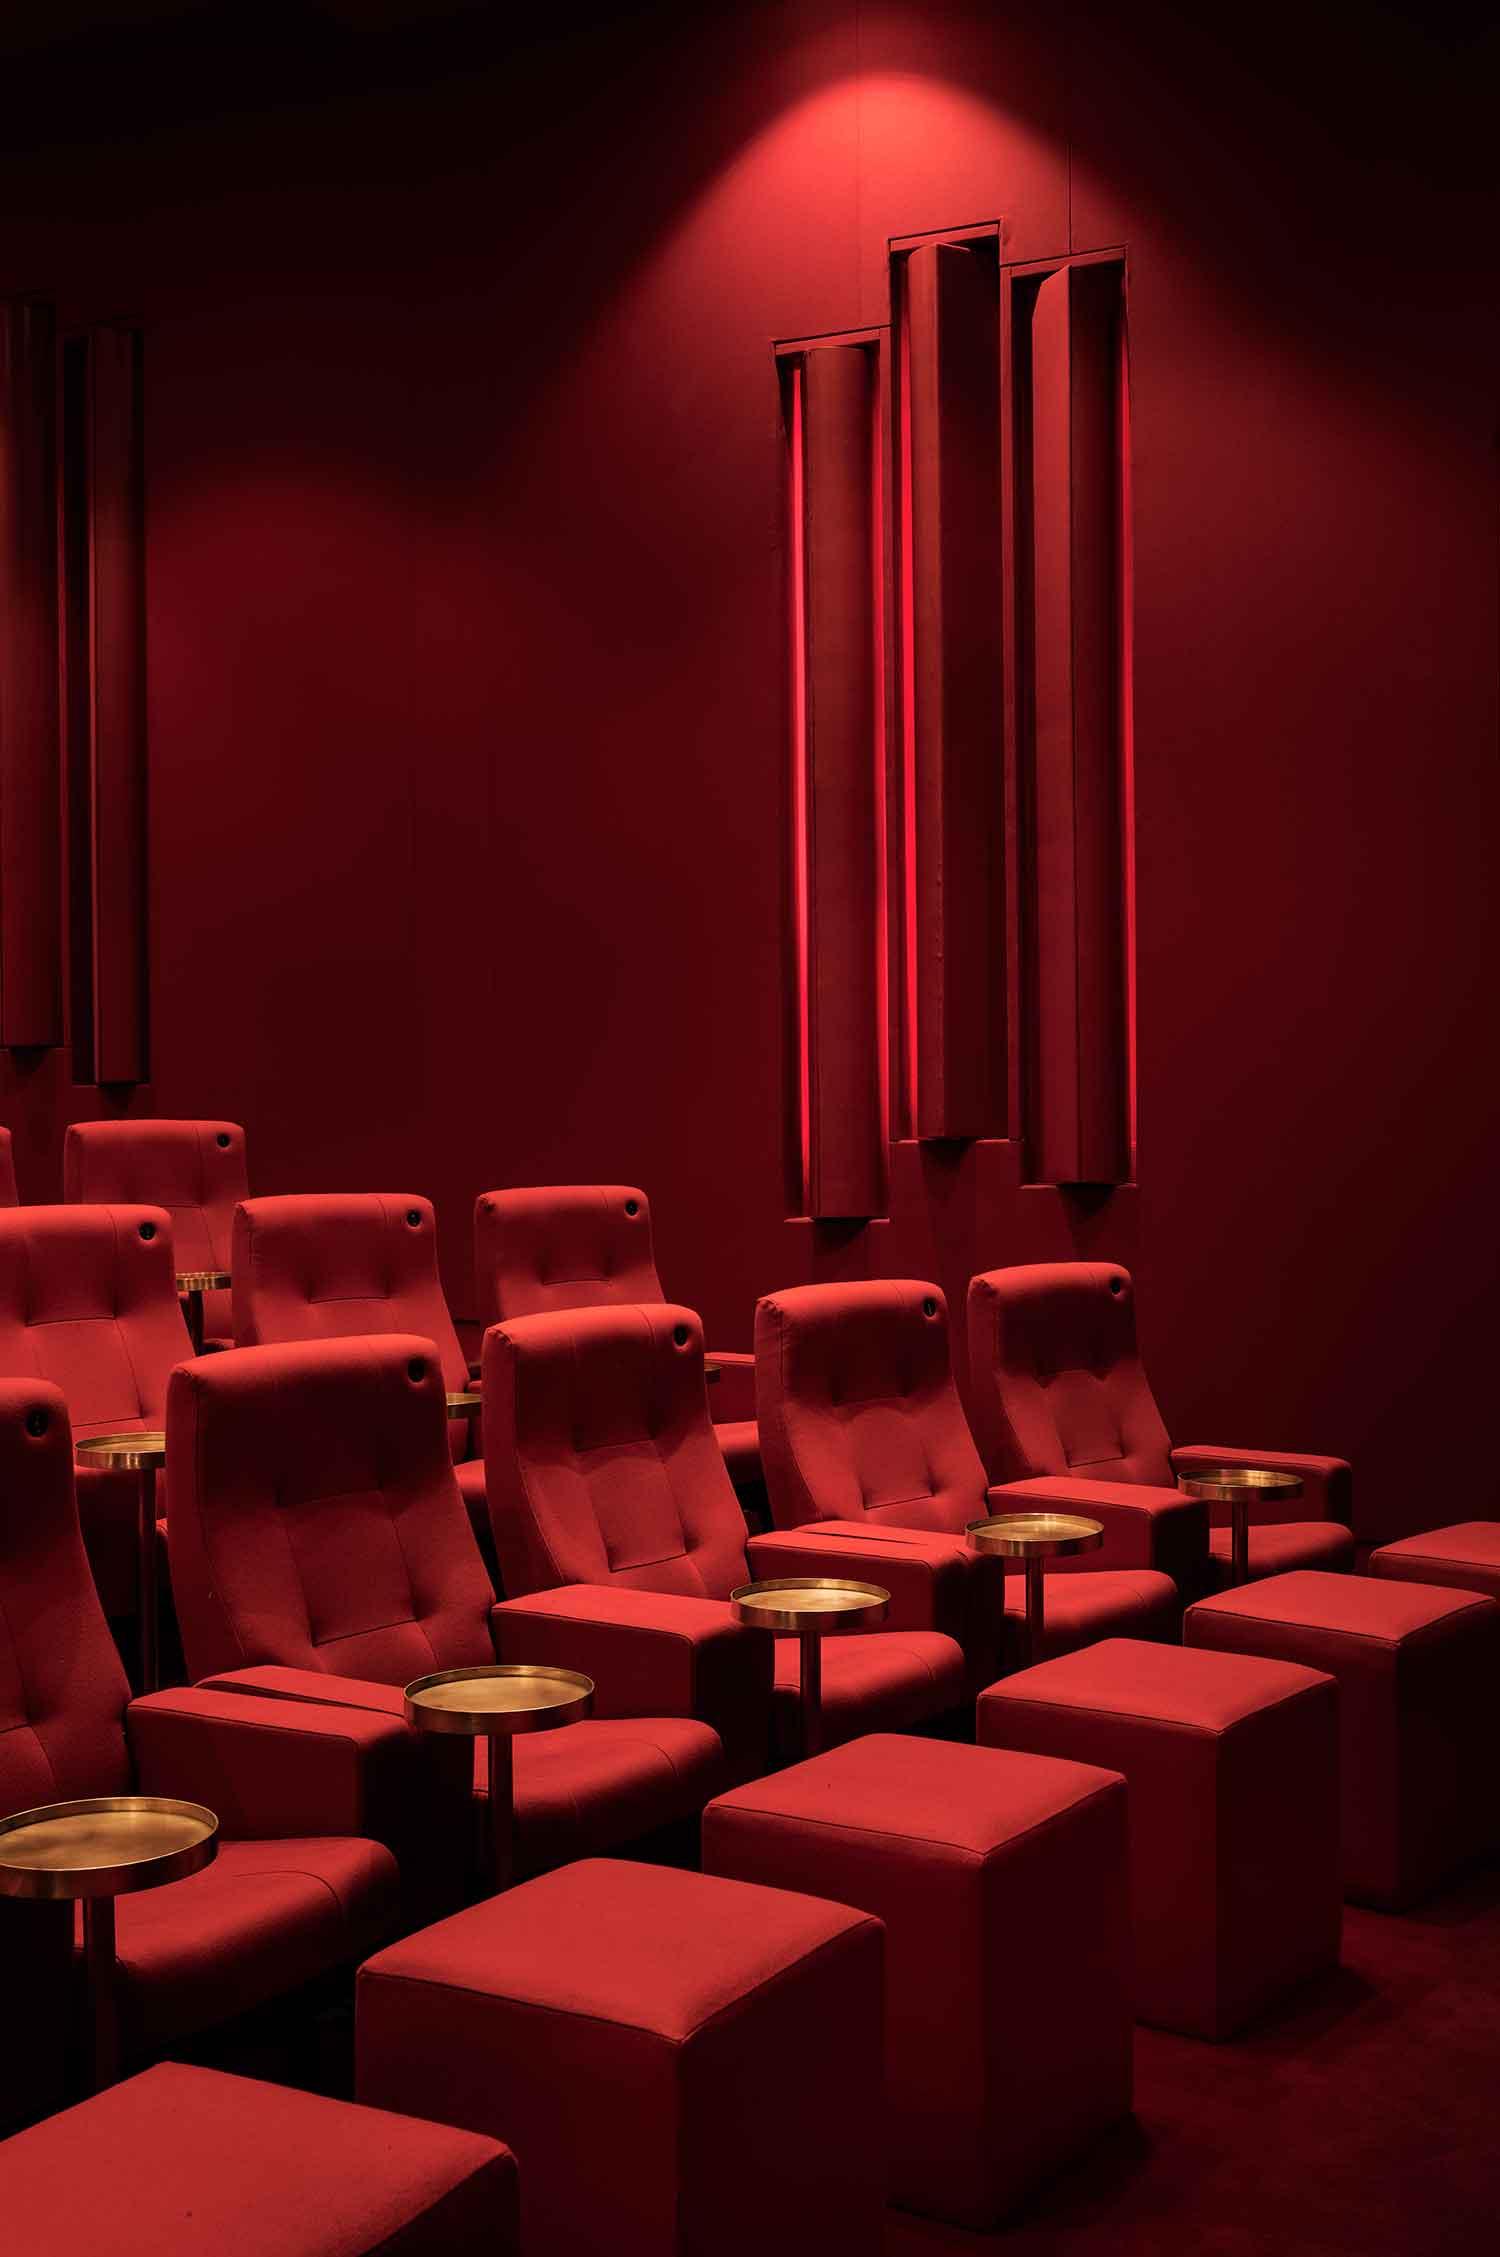 Olympic Studios Cinema by Simone McEwan   Yellowtrace